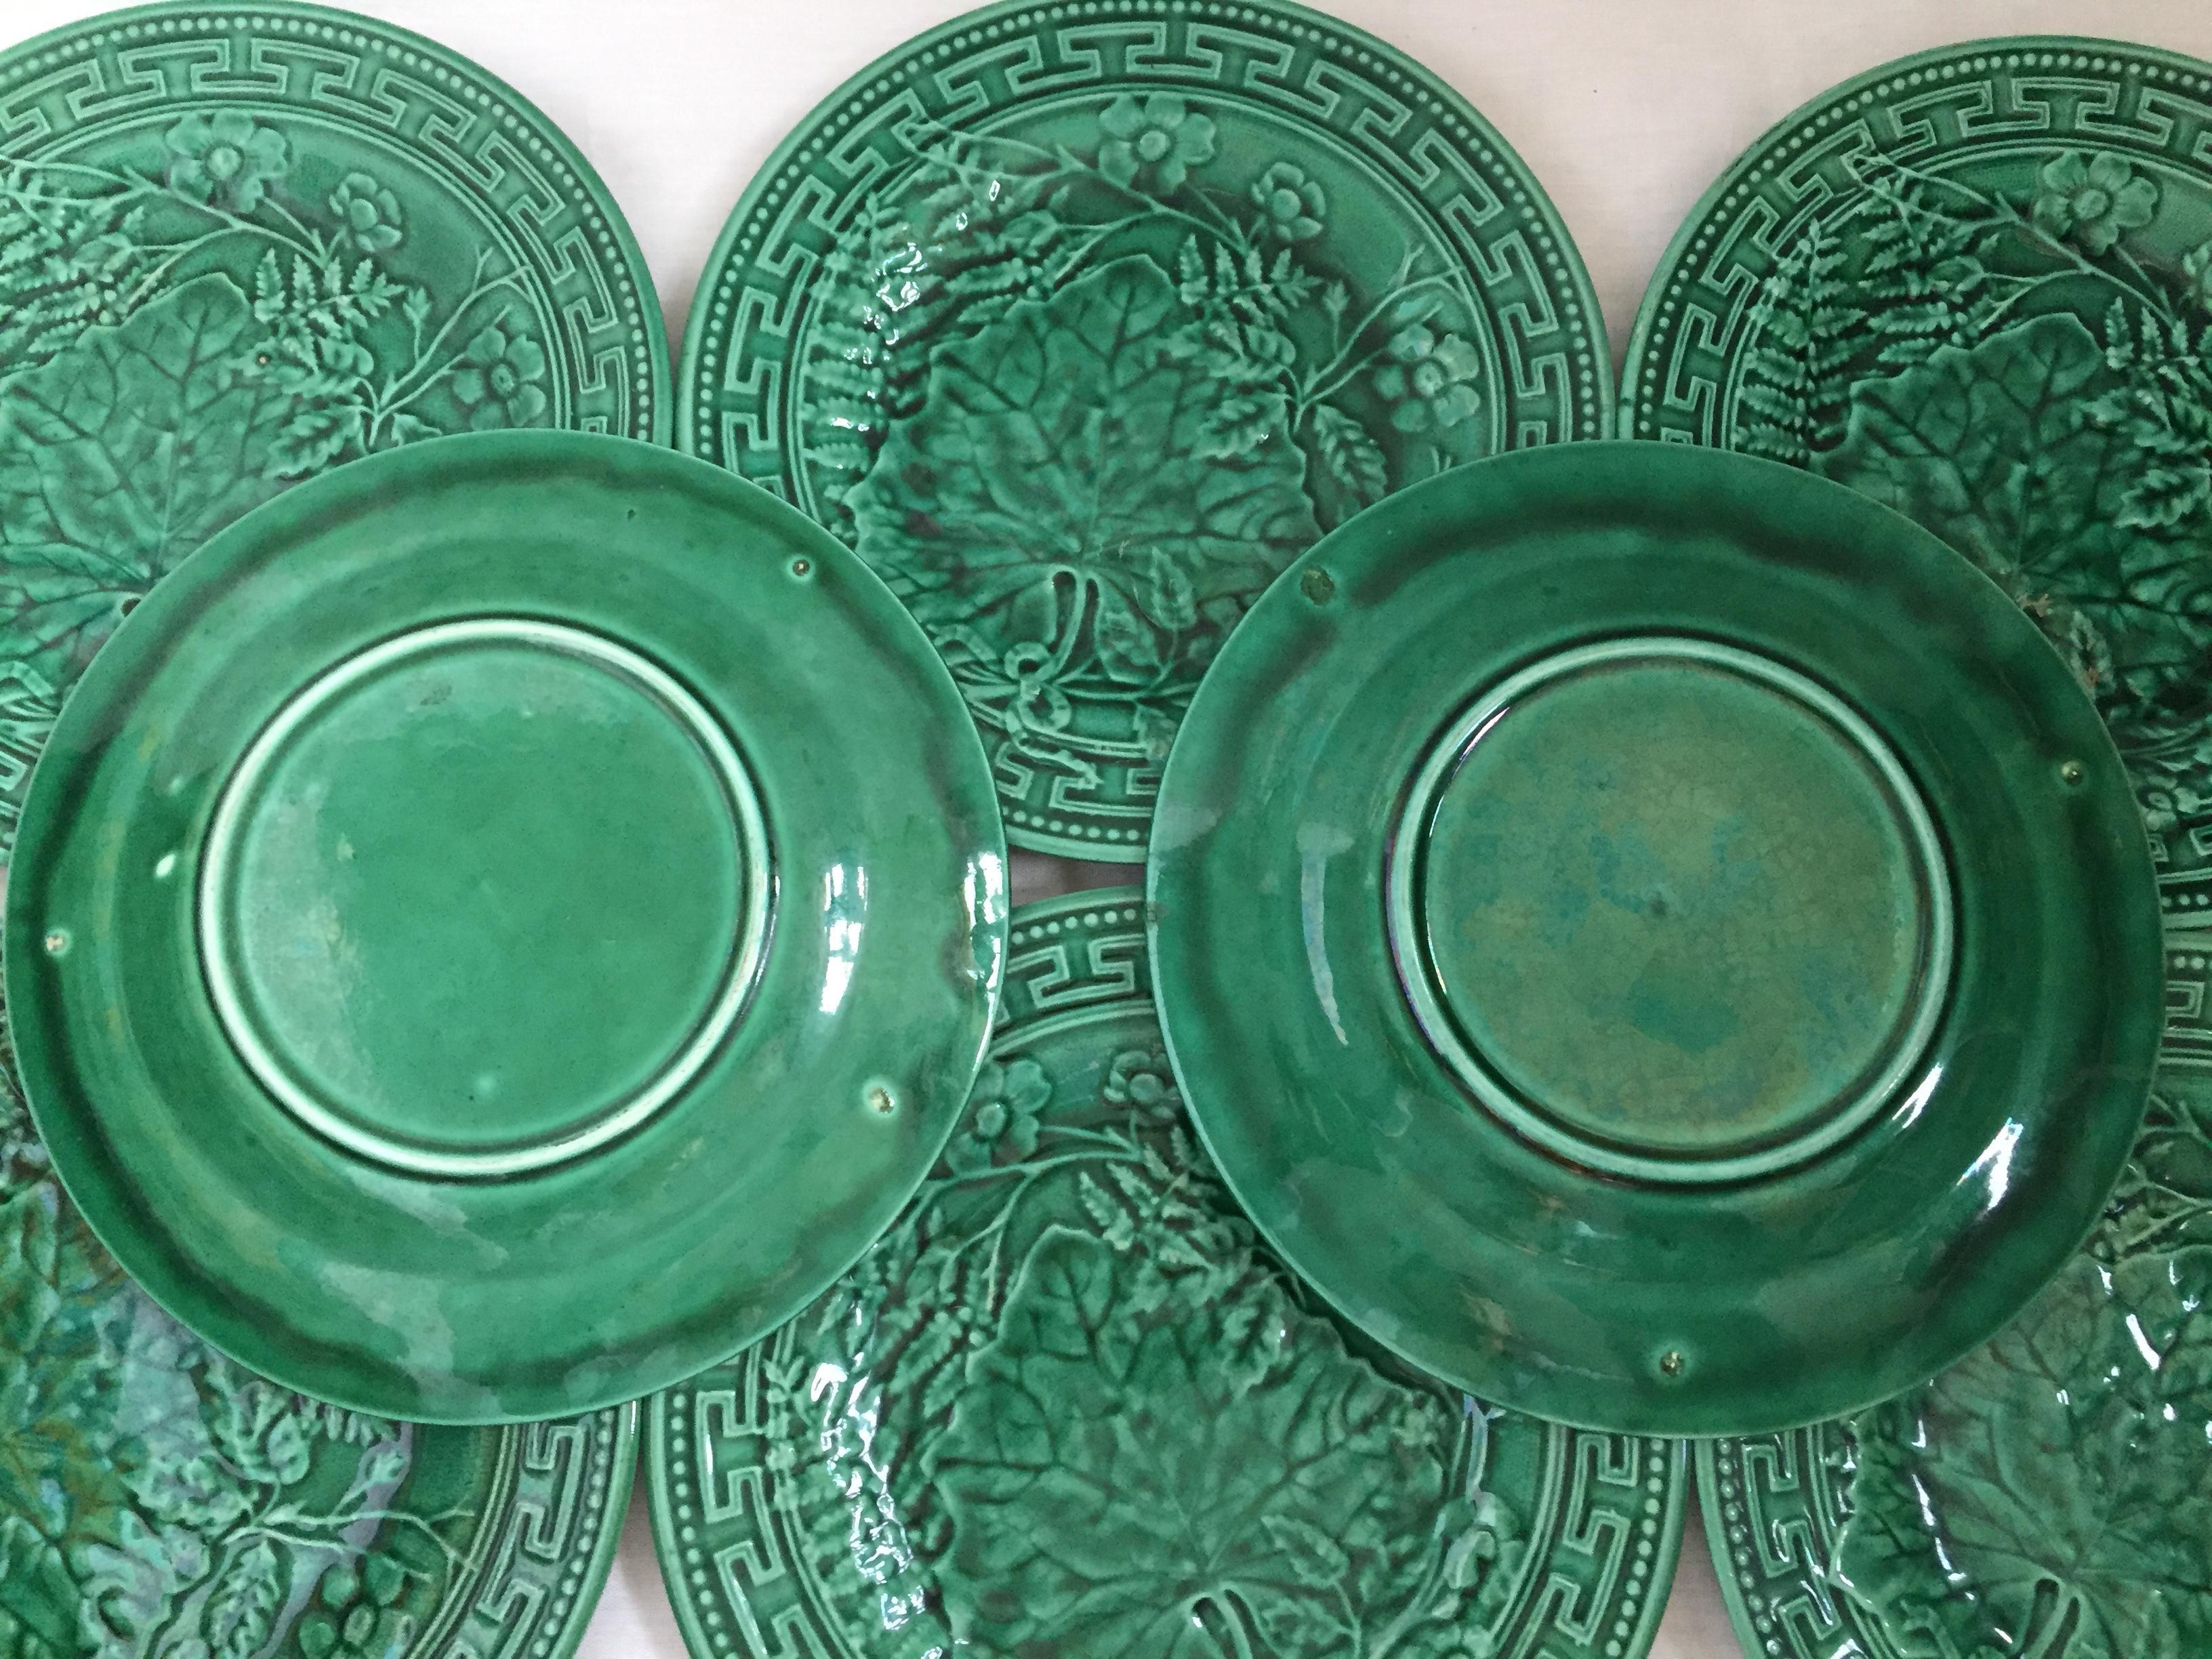 Majolica Set of 8 Green Plates With Greek Key Design - Image 5 of 7  sc 1 st  Chairish & Majolica Set of 8 Green Plates With Greek Key Design | Chairish